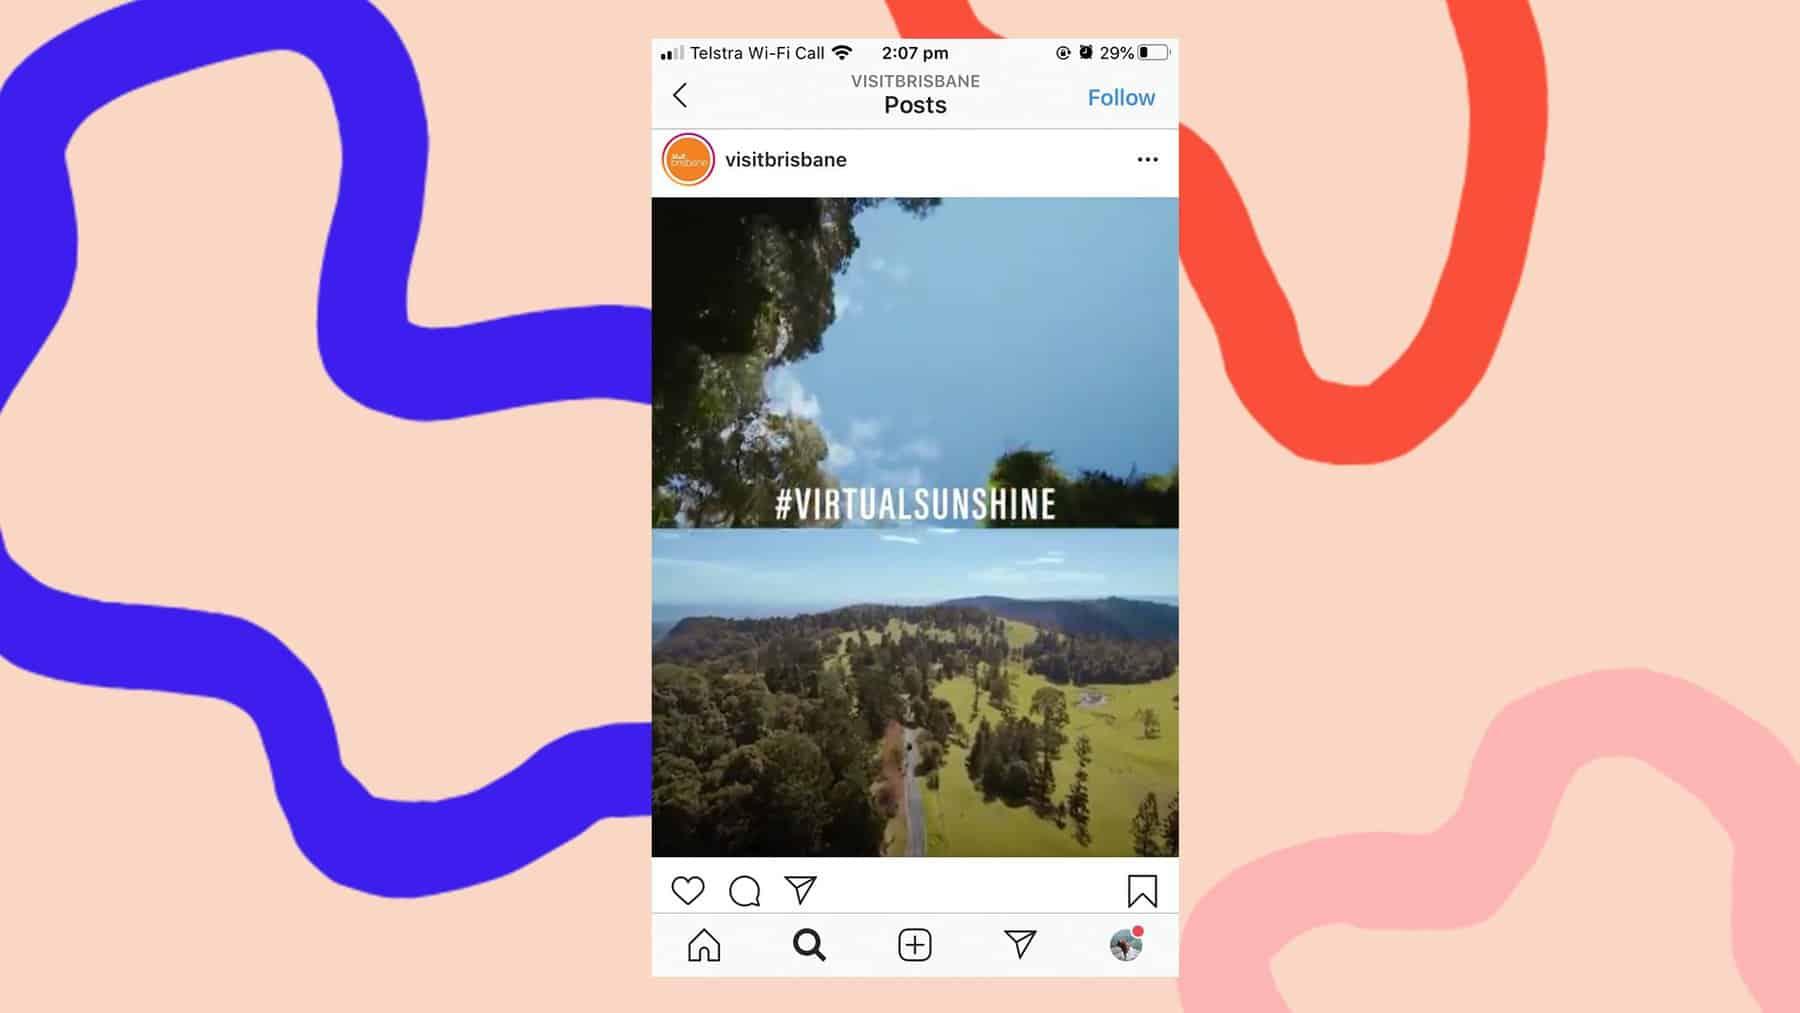 Visit Brisbane #VirtualSunshine